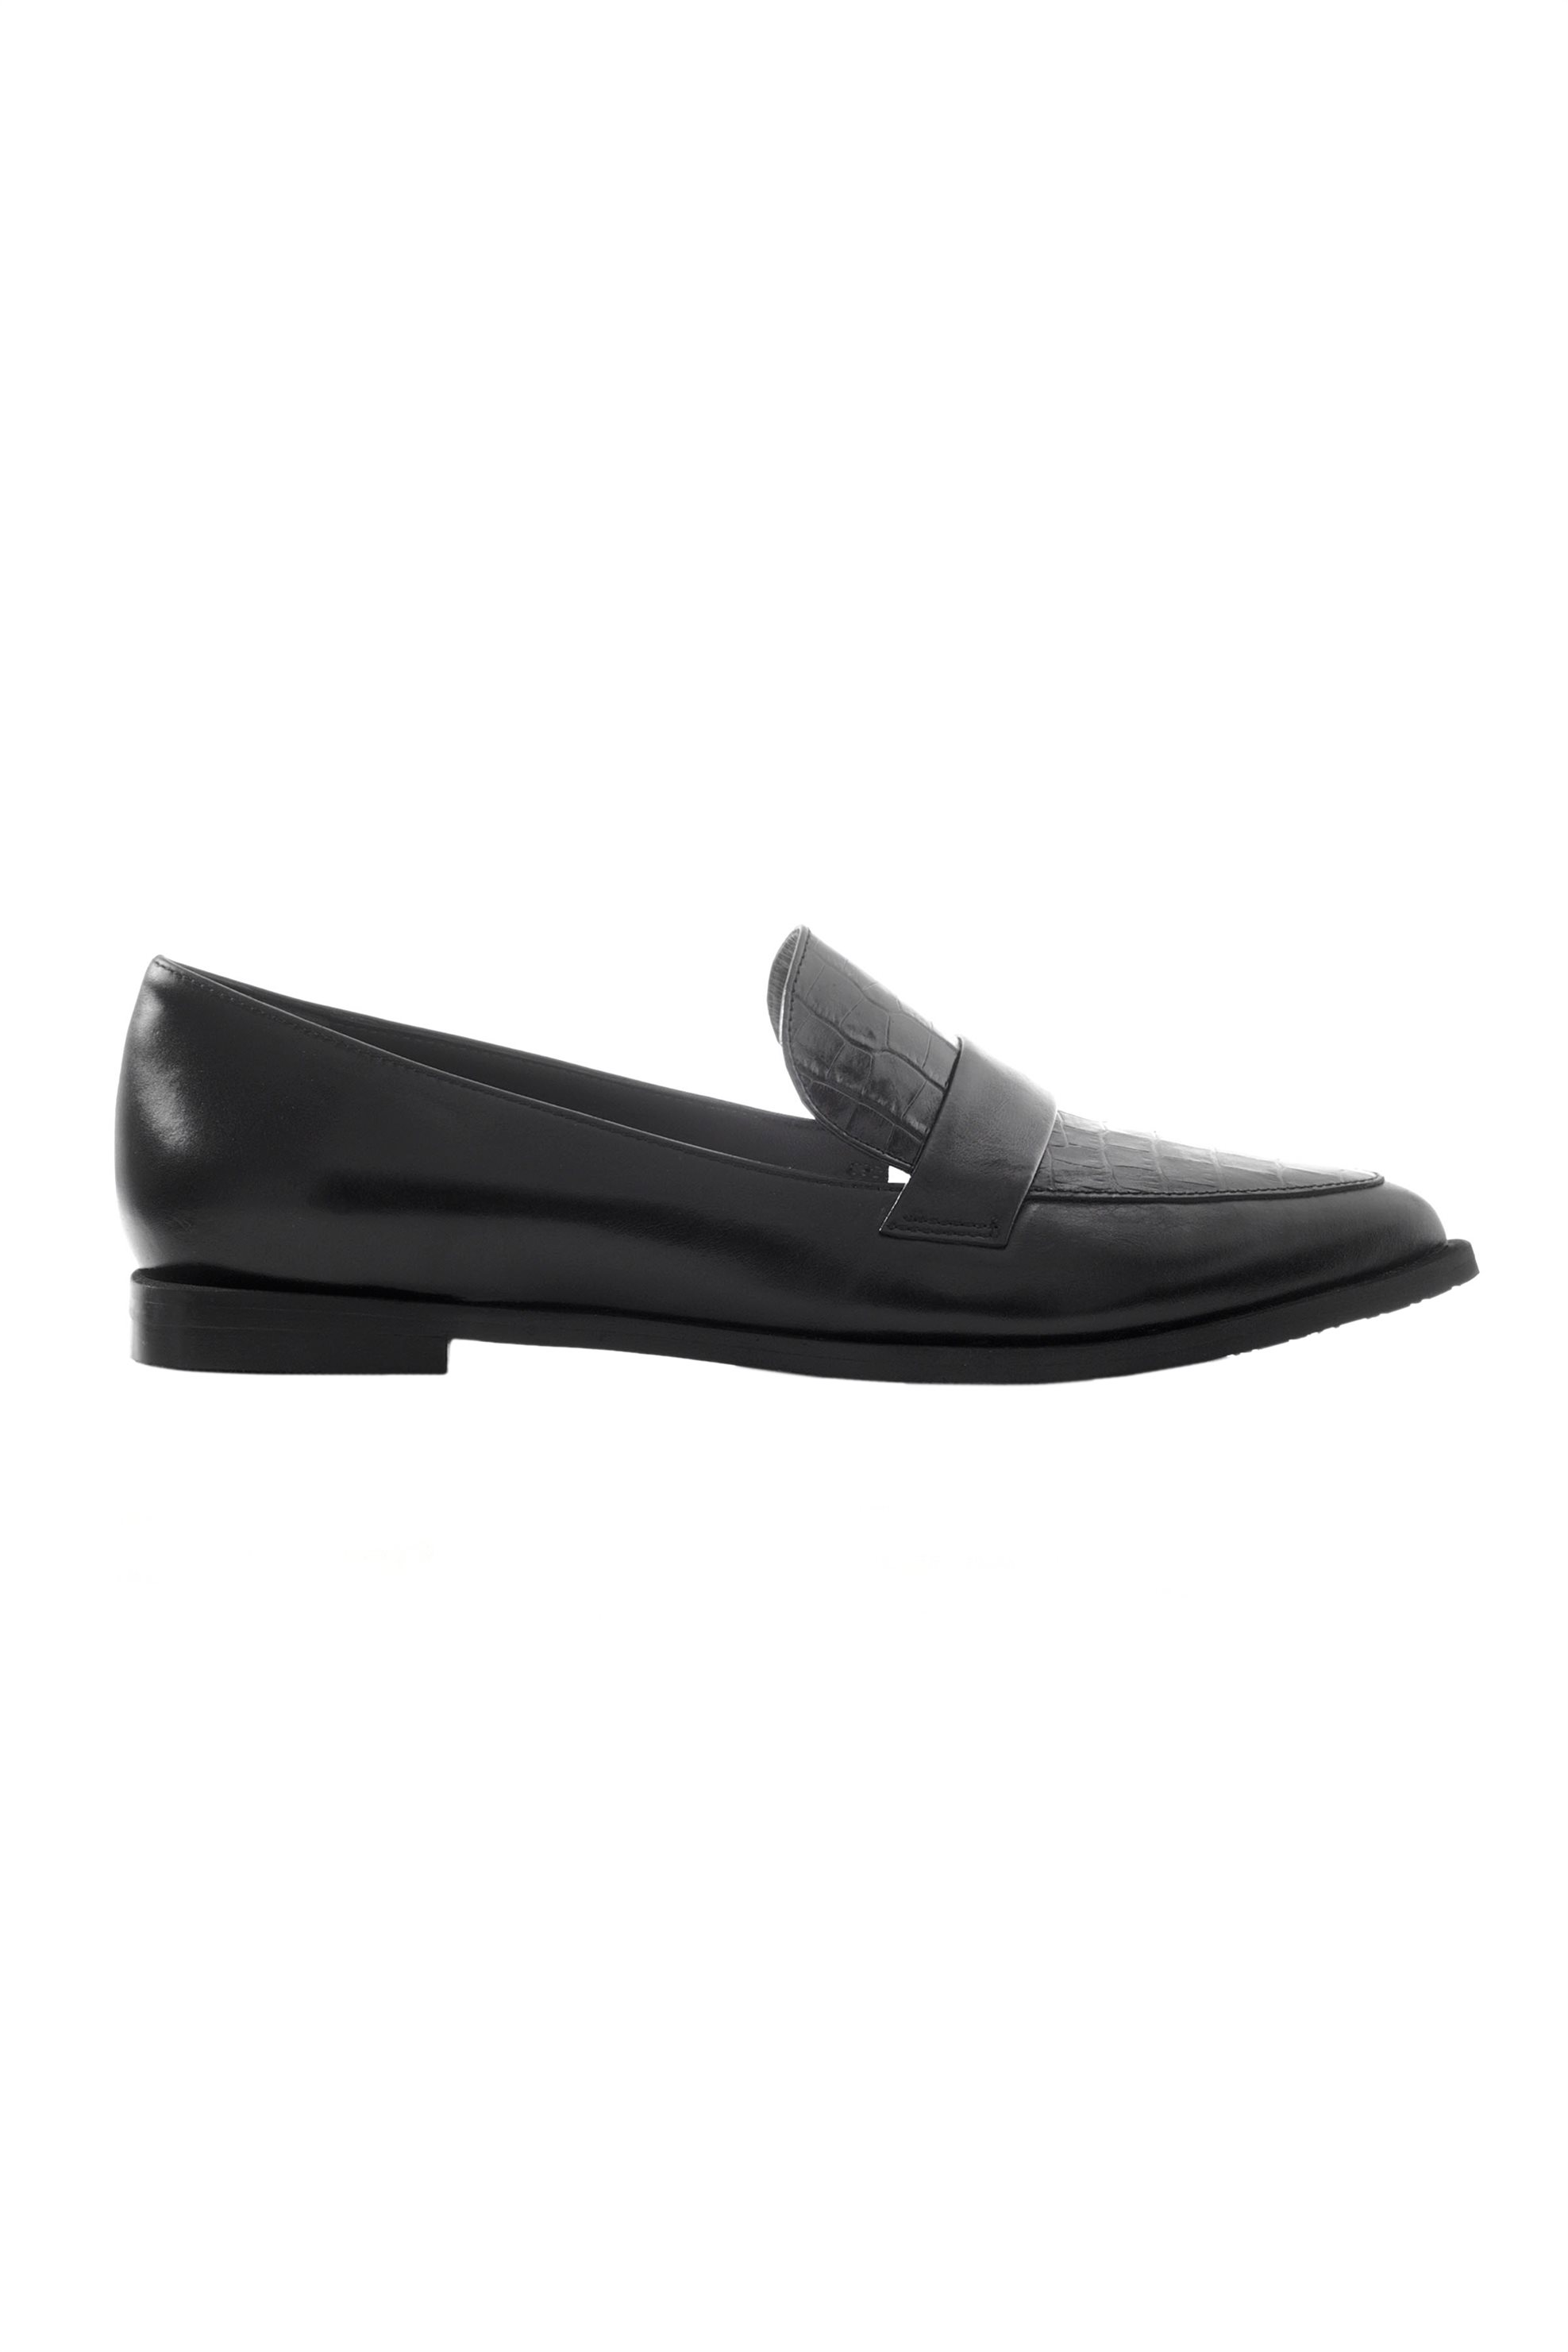 Chaniotakis γυναικεία δερμάτινα loafers μονόχρωμα - 202.01.07.00223.130 - Μαύρο